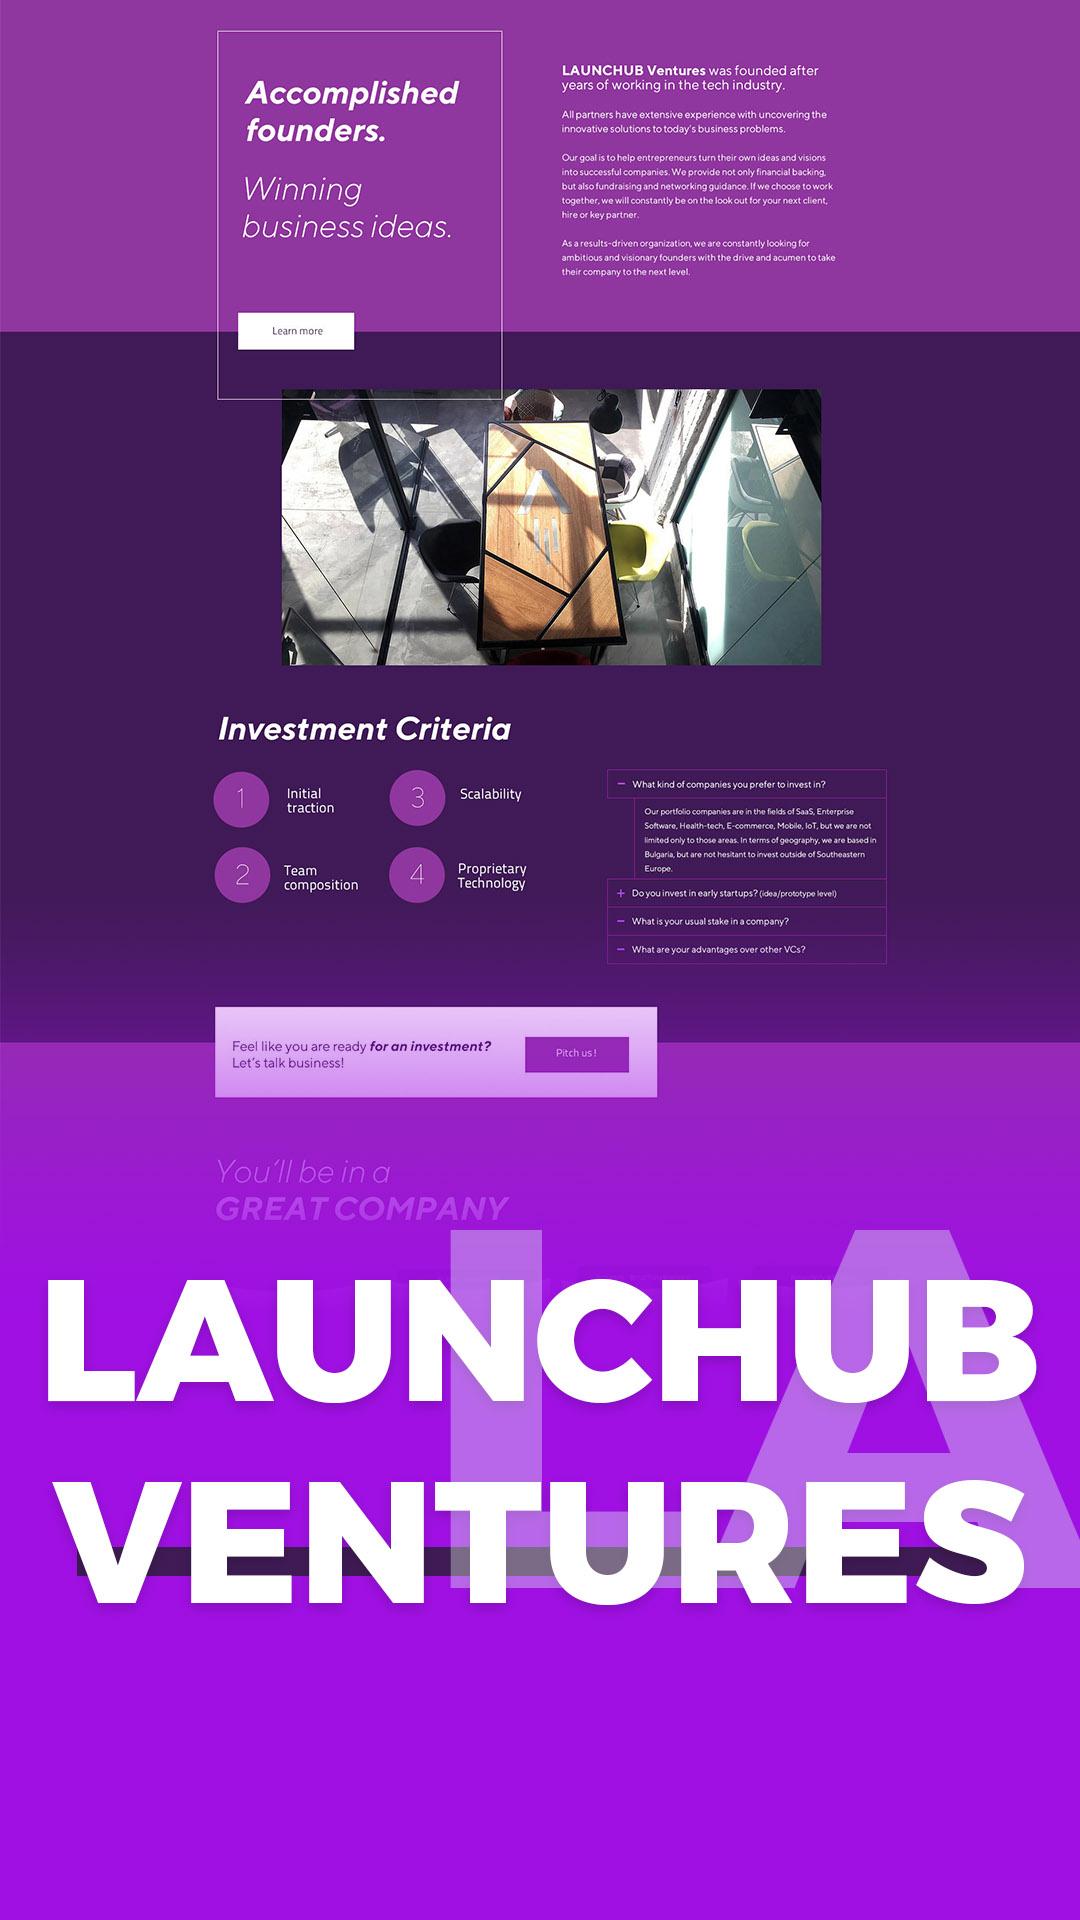 wordpress 09 launchub 2018 vertical